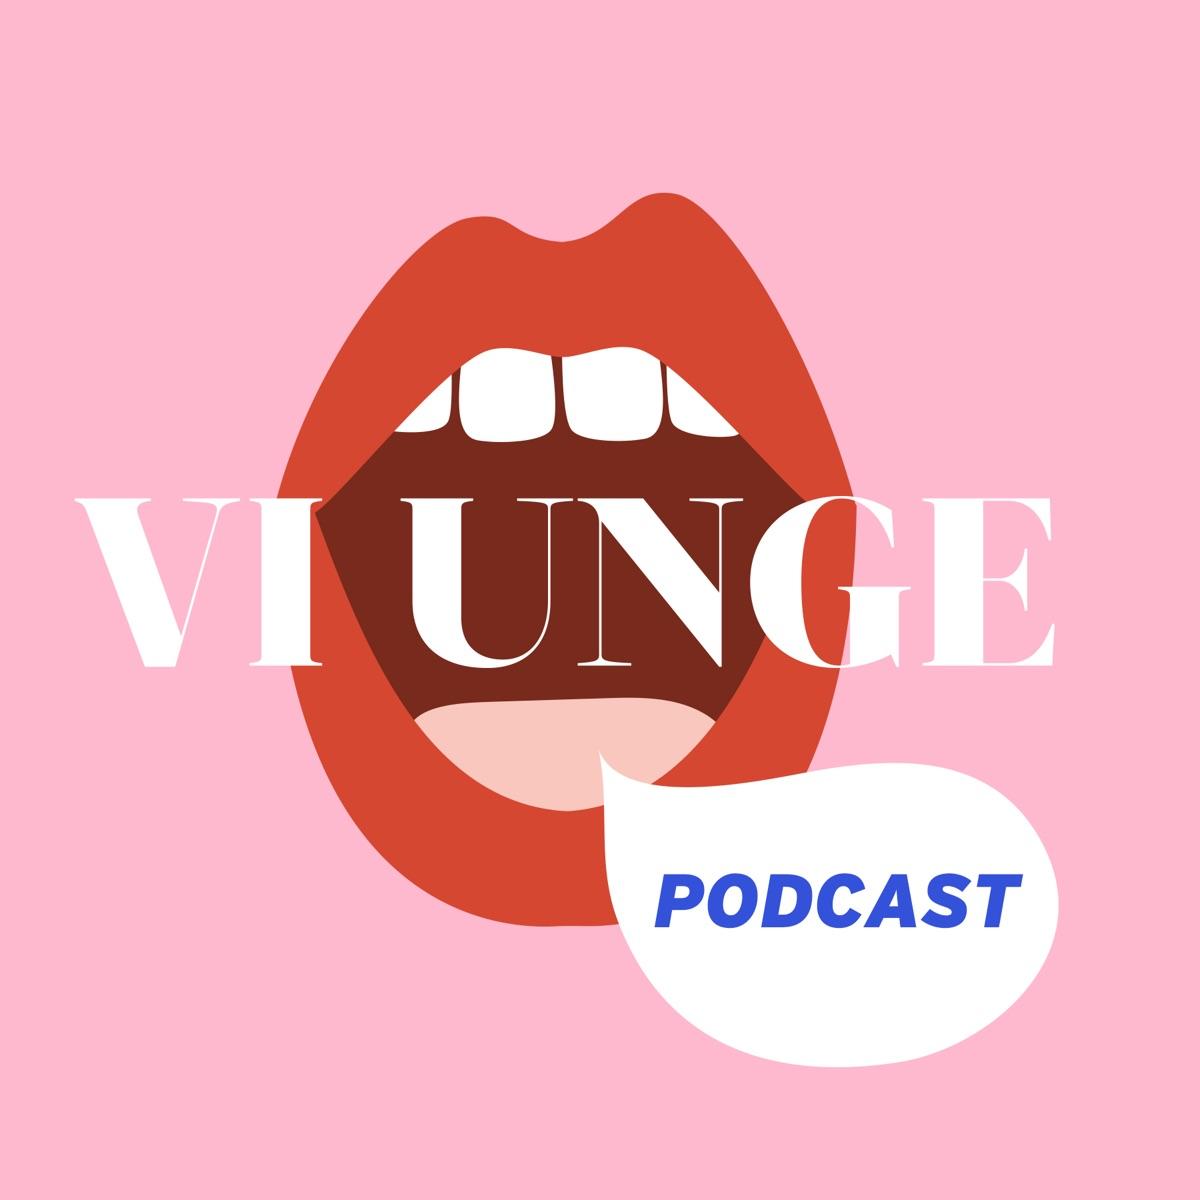 Vi Unge Podcast